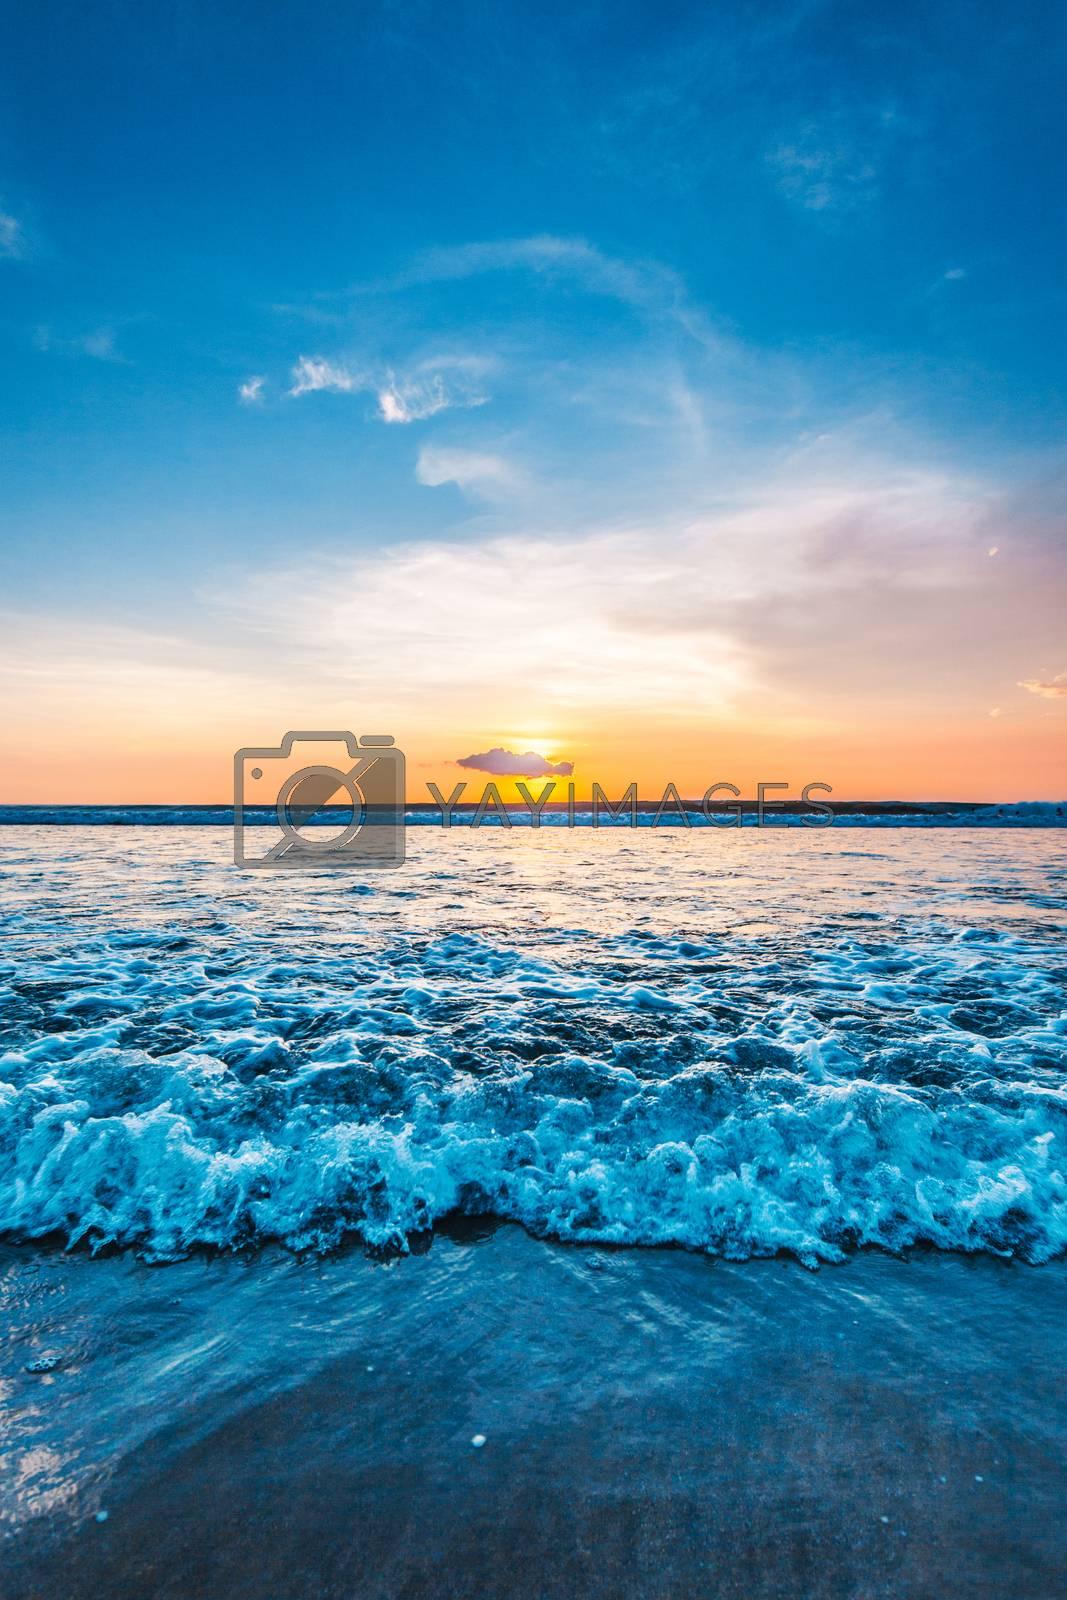 Sea waves at sandy beach at sunset, sun hiding behind a cloud